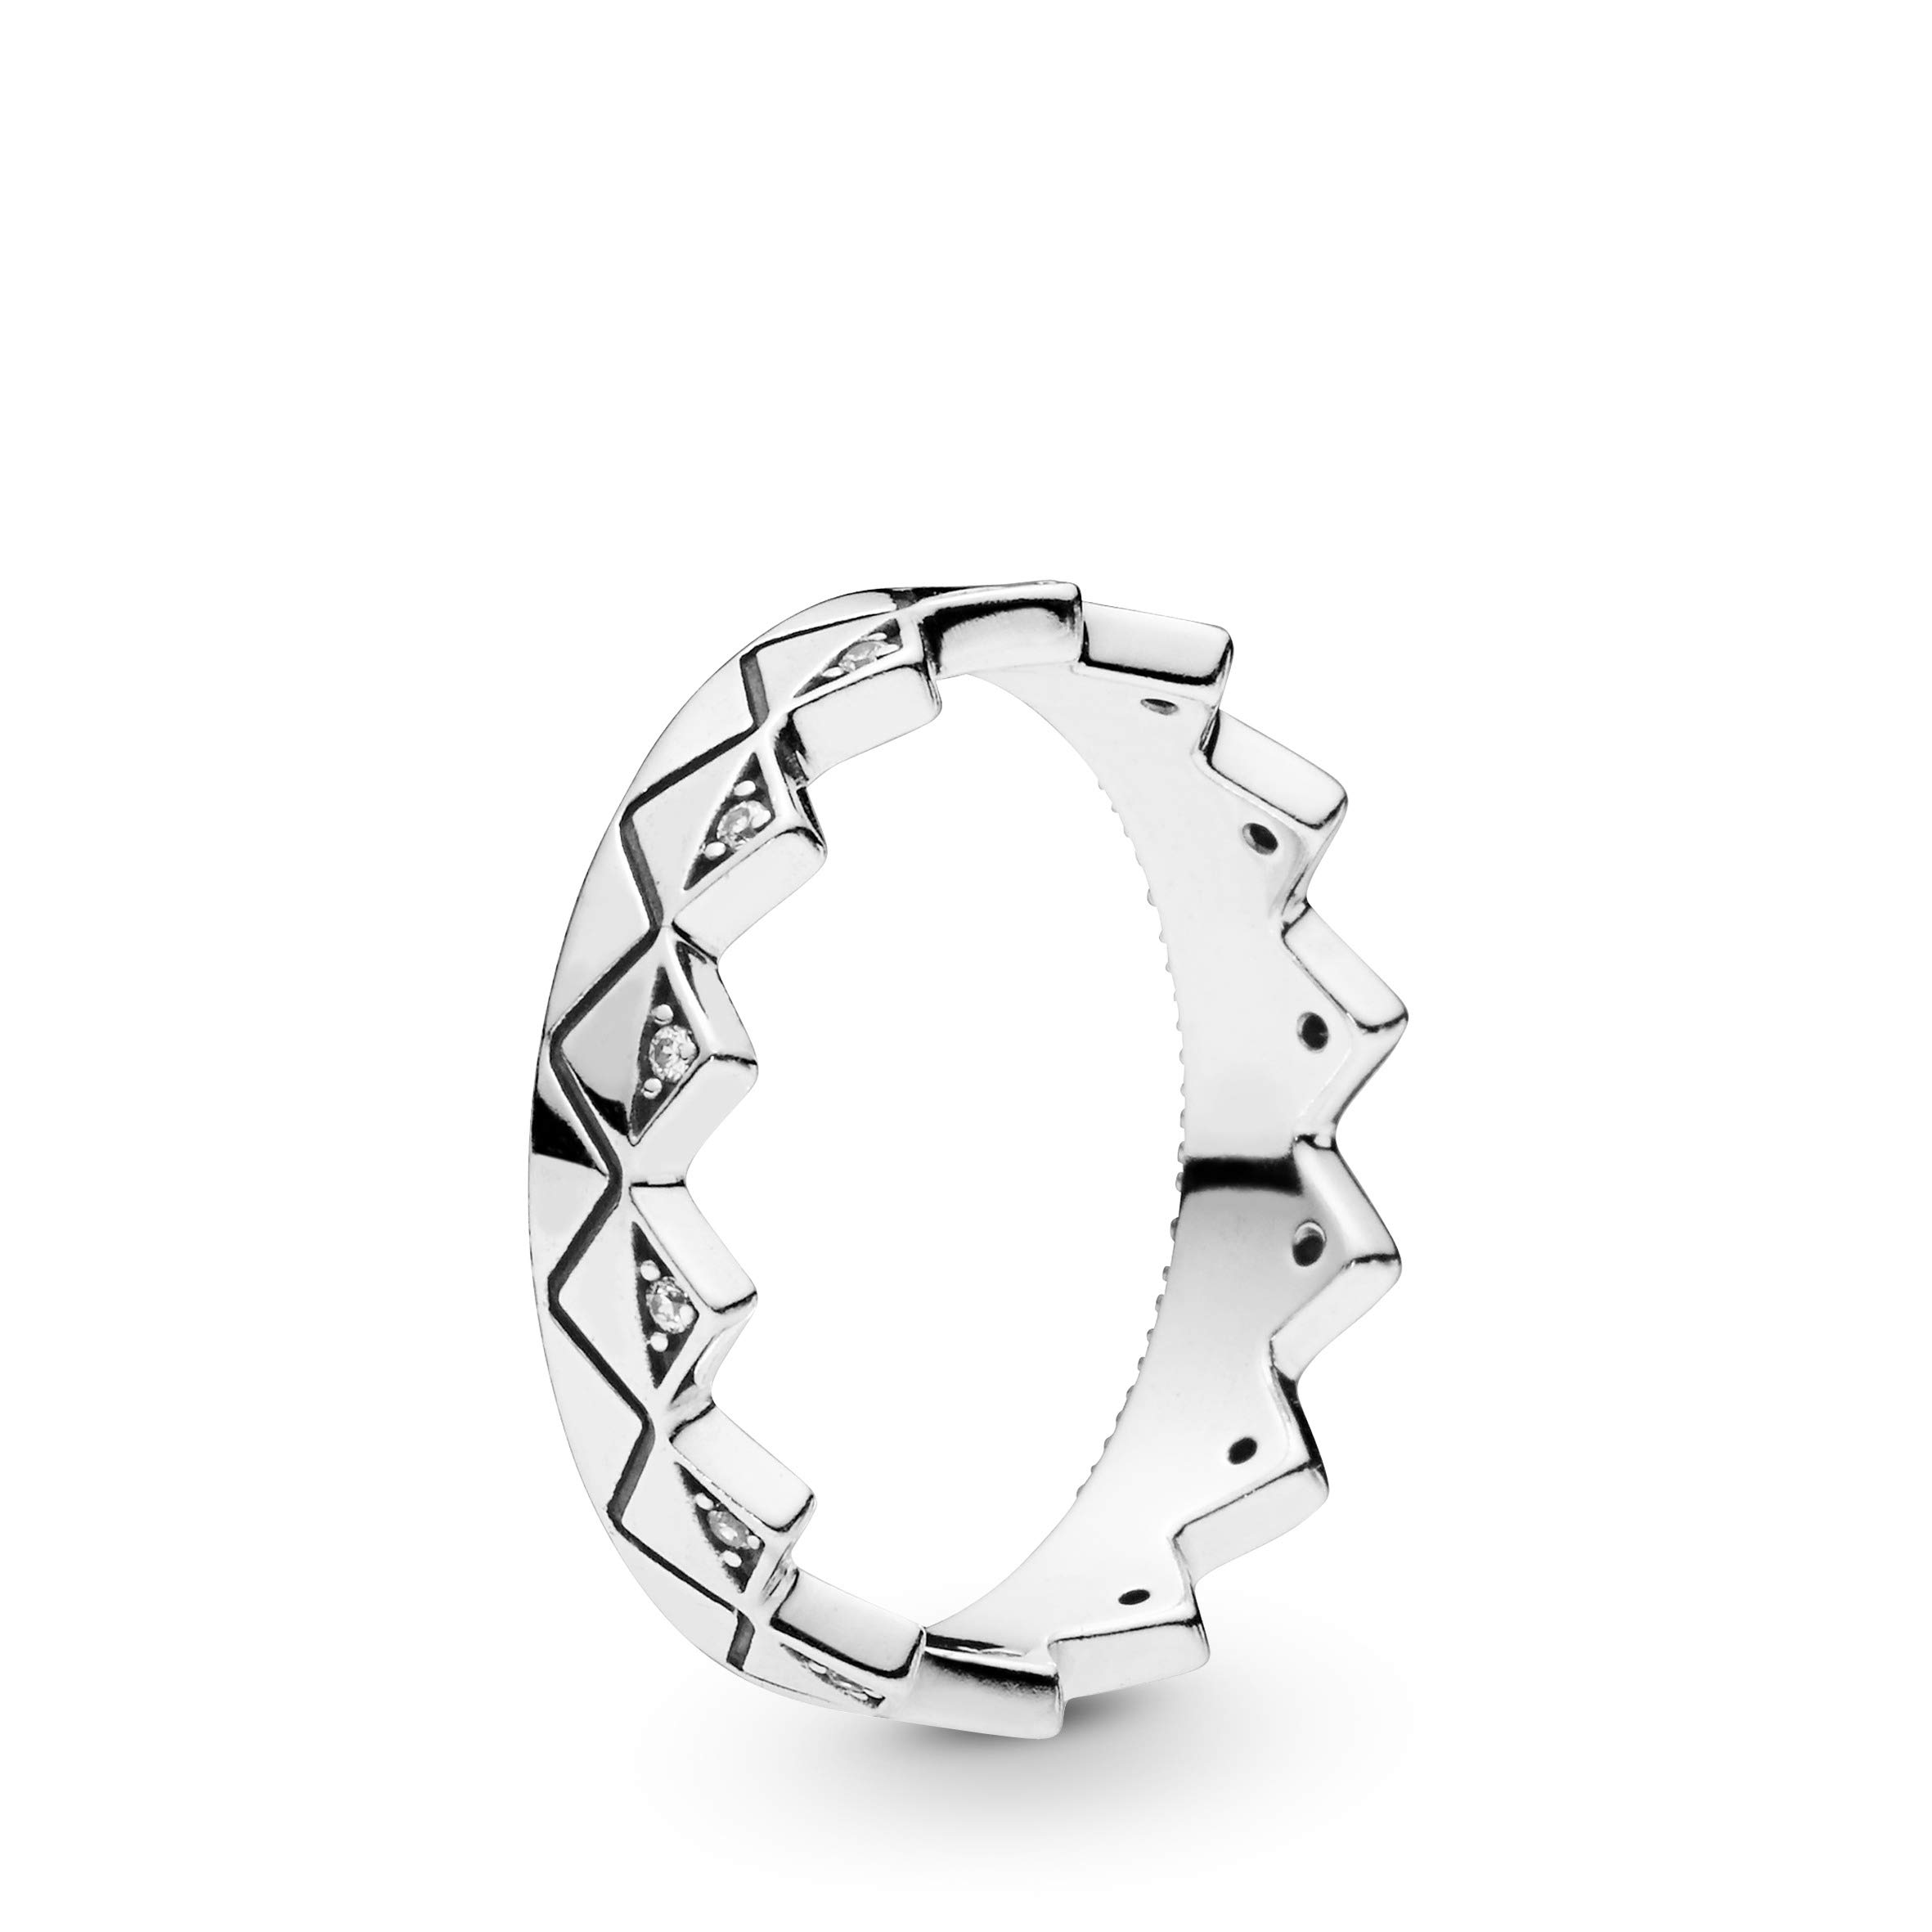 PANDORA Exotic Crown 925 Sterling Silver Ring, Size: EUR-56, US-7.5-198033CZ-56